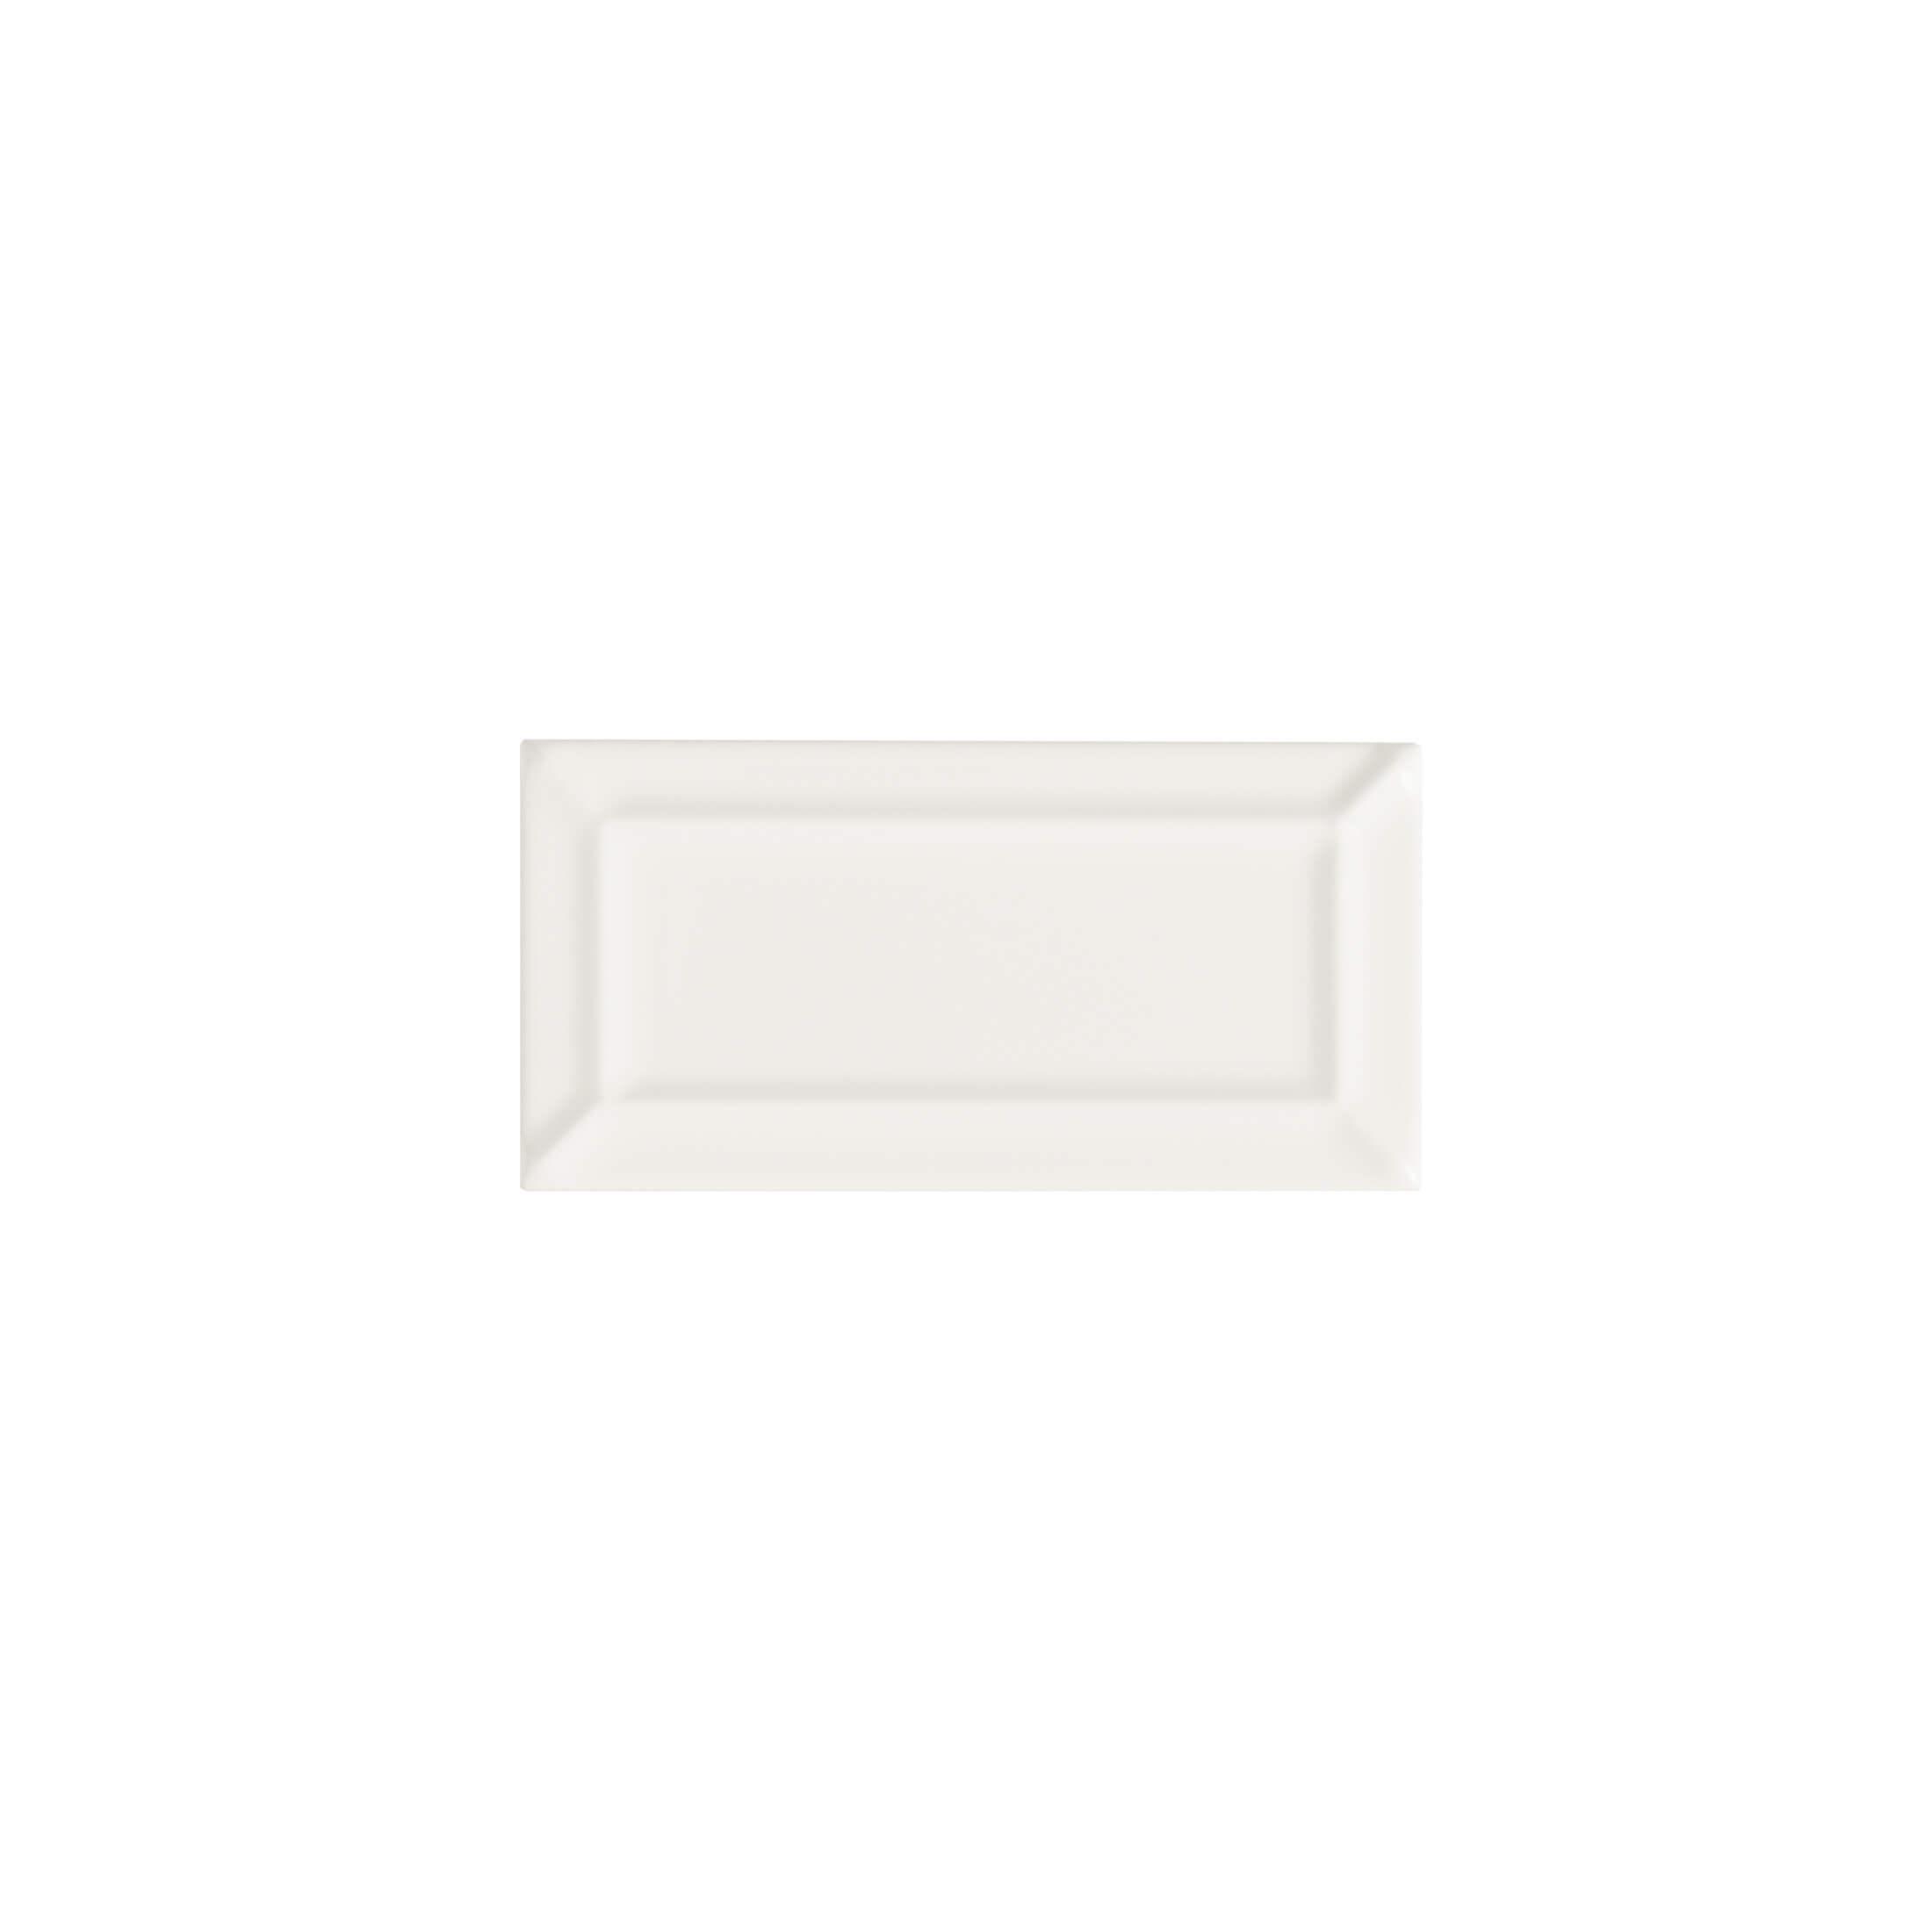 ADNE1104 - LISO EDGE - 7.5 cm X 15 cm